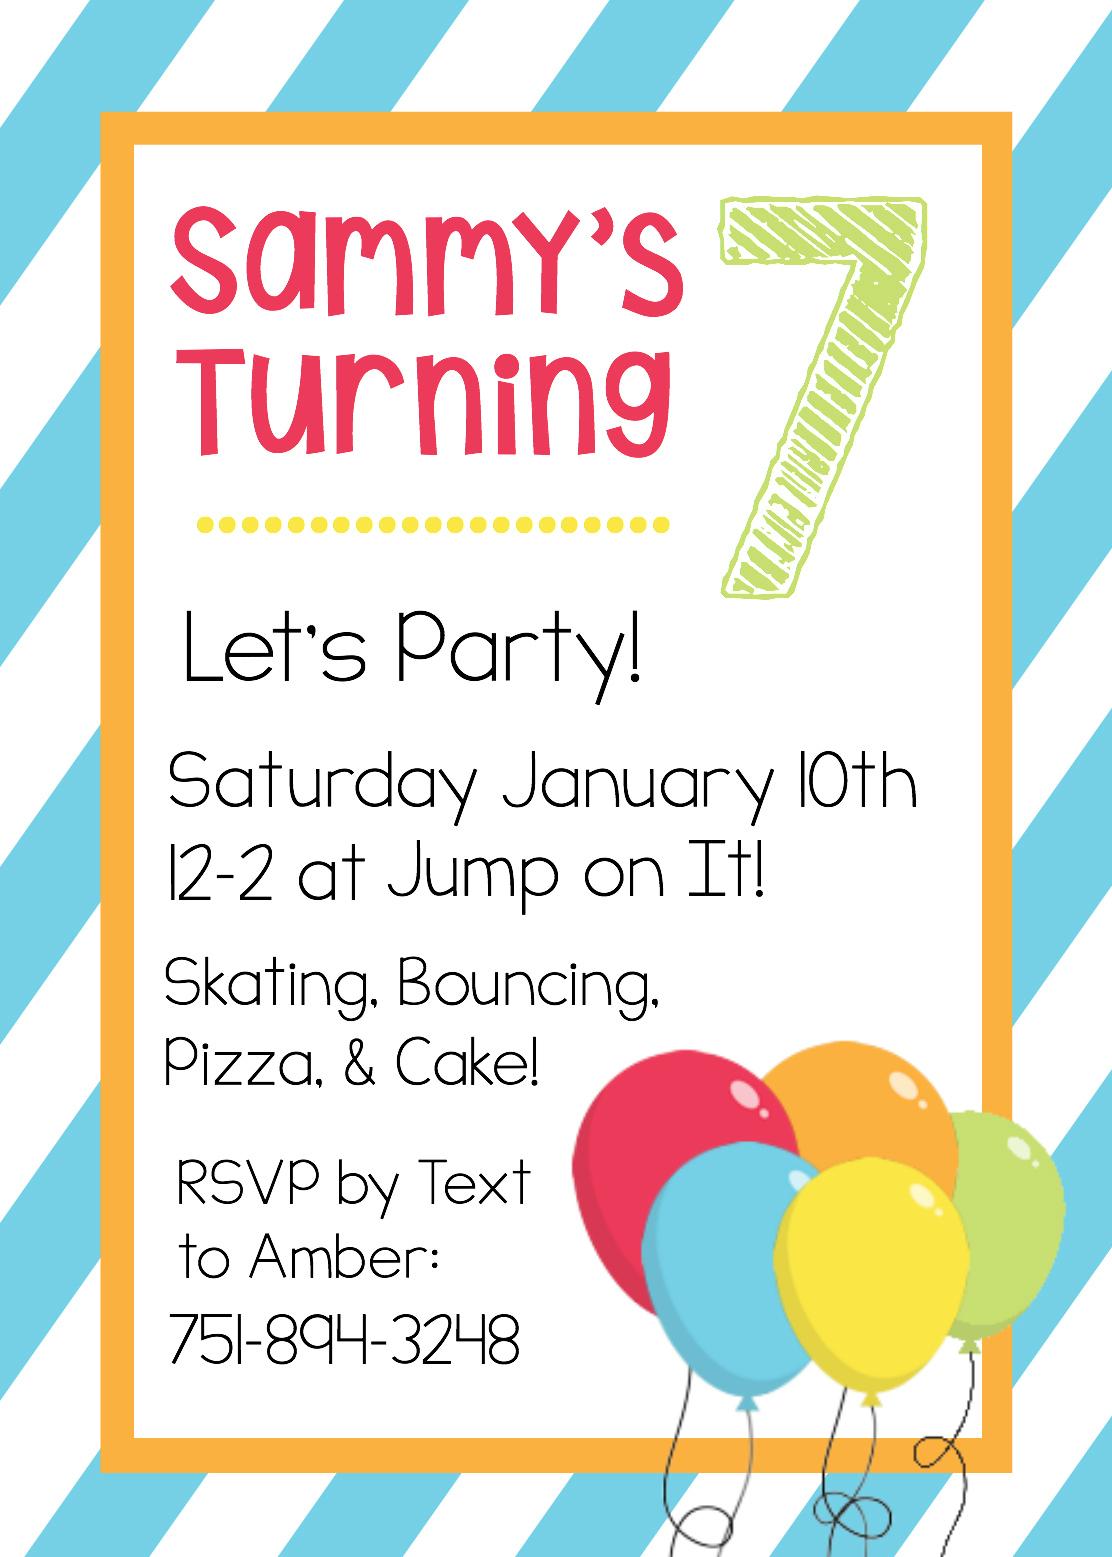 Free Printable Birthday Invitation Templates - Free Printable Boy Birthday Invitations